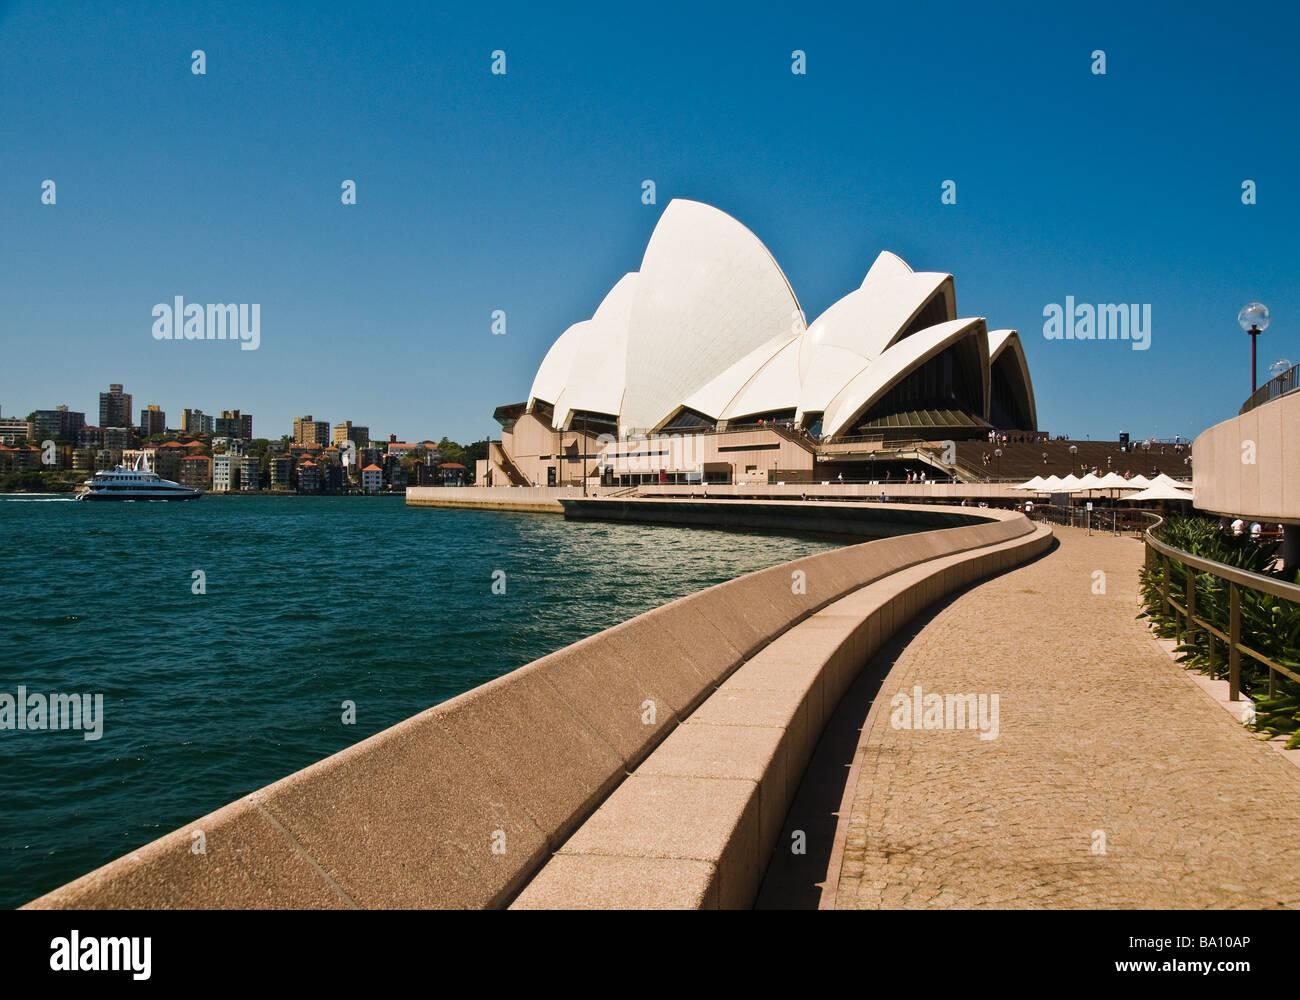 Opera House Circular Quay Sydney NSW Australia - Stock Image